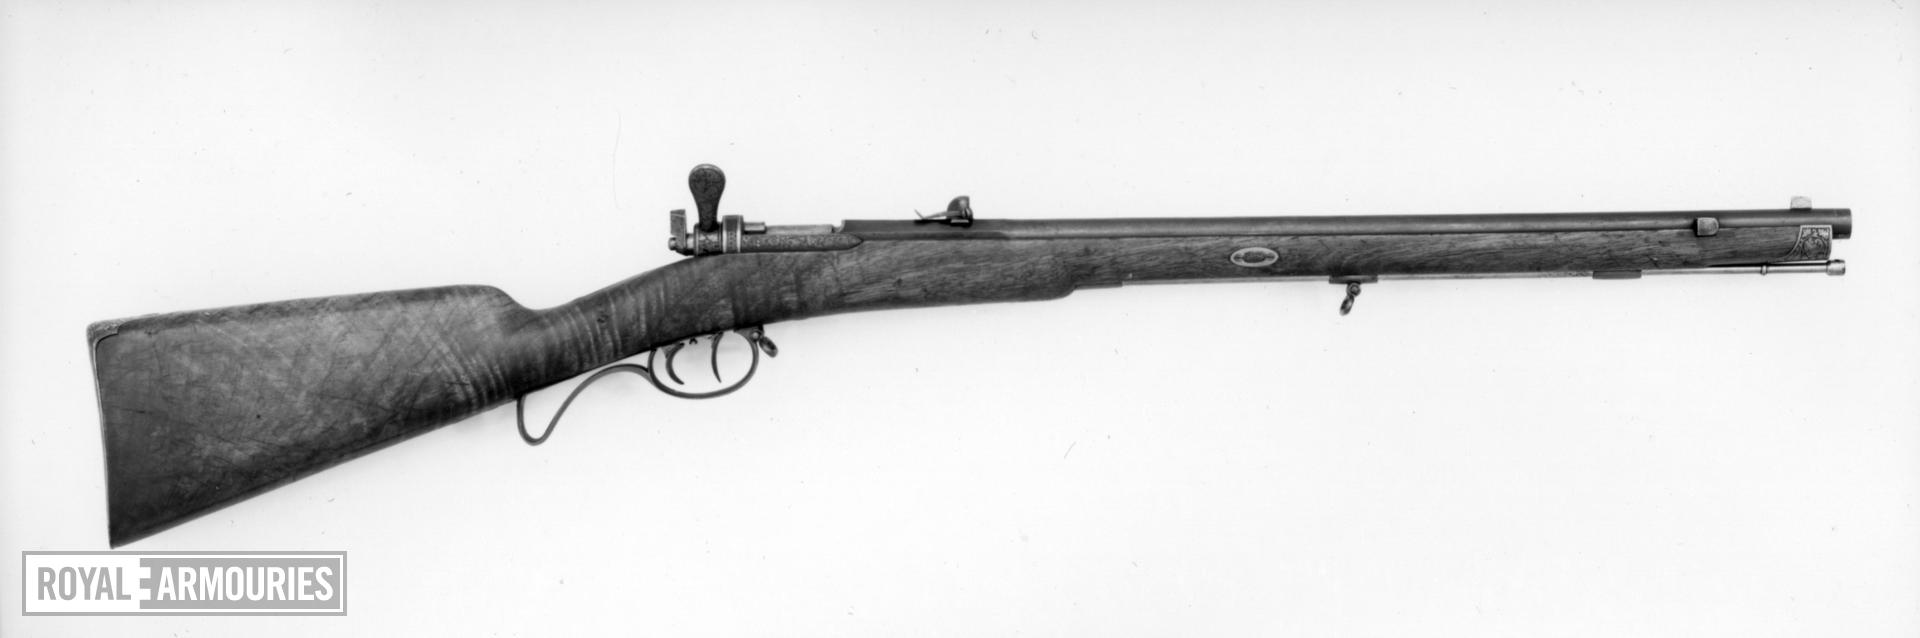 Needlefire bolt-action rifle